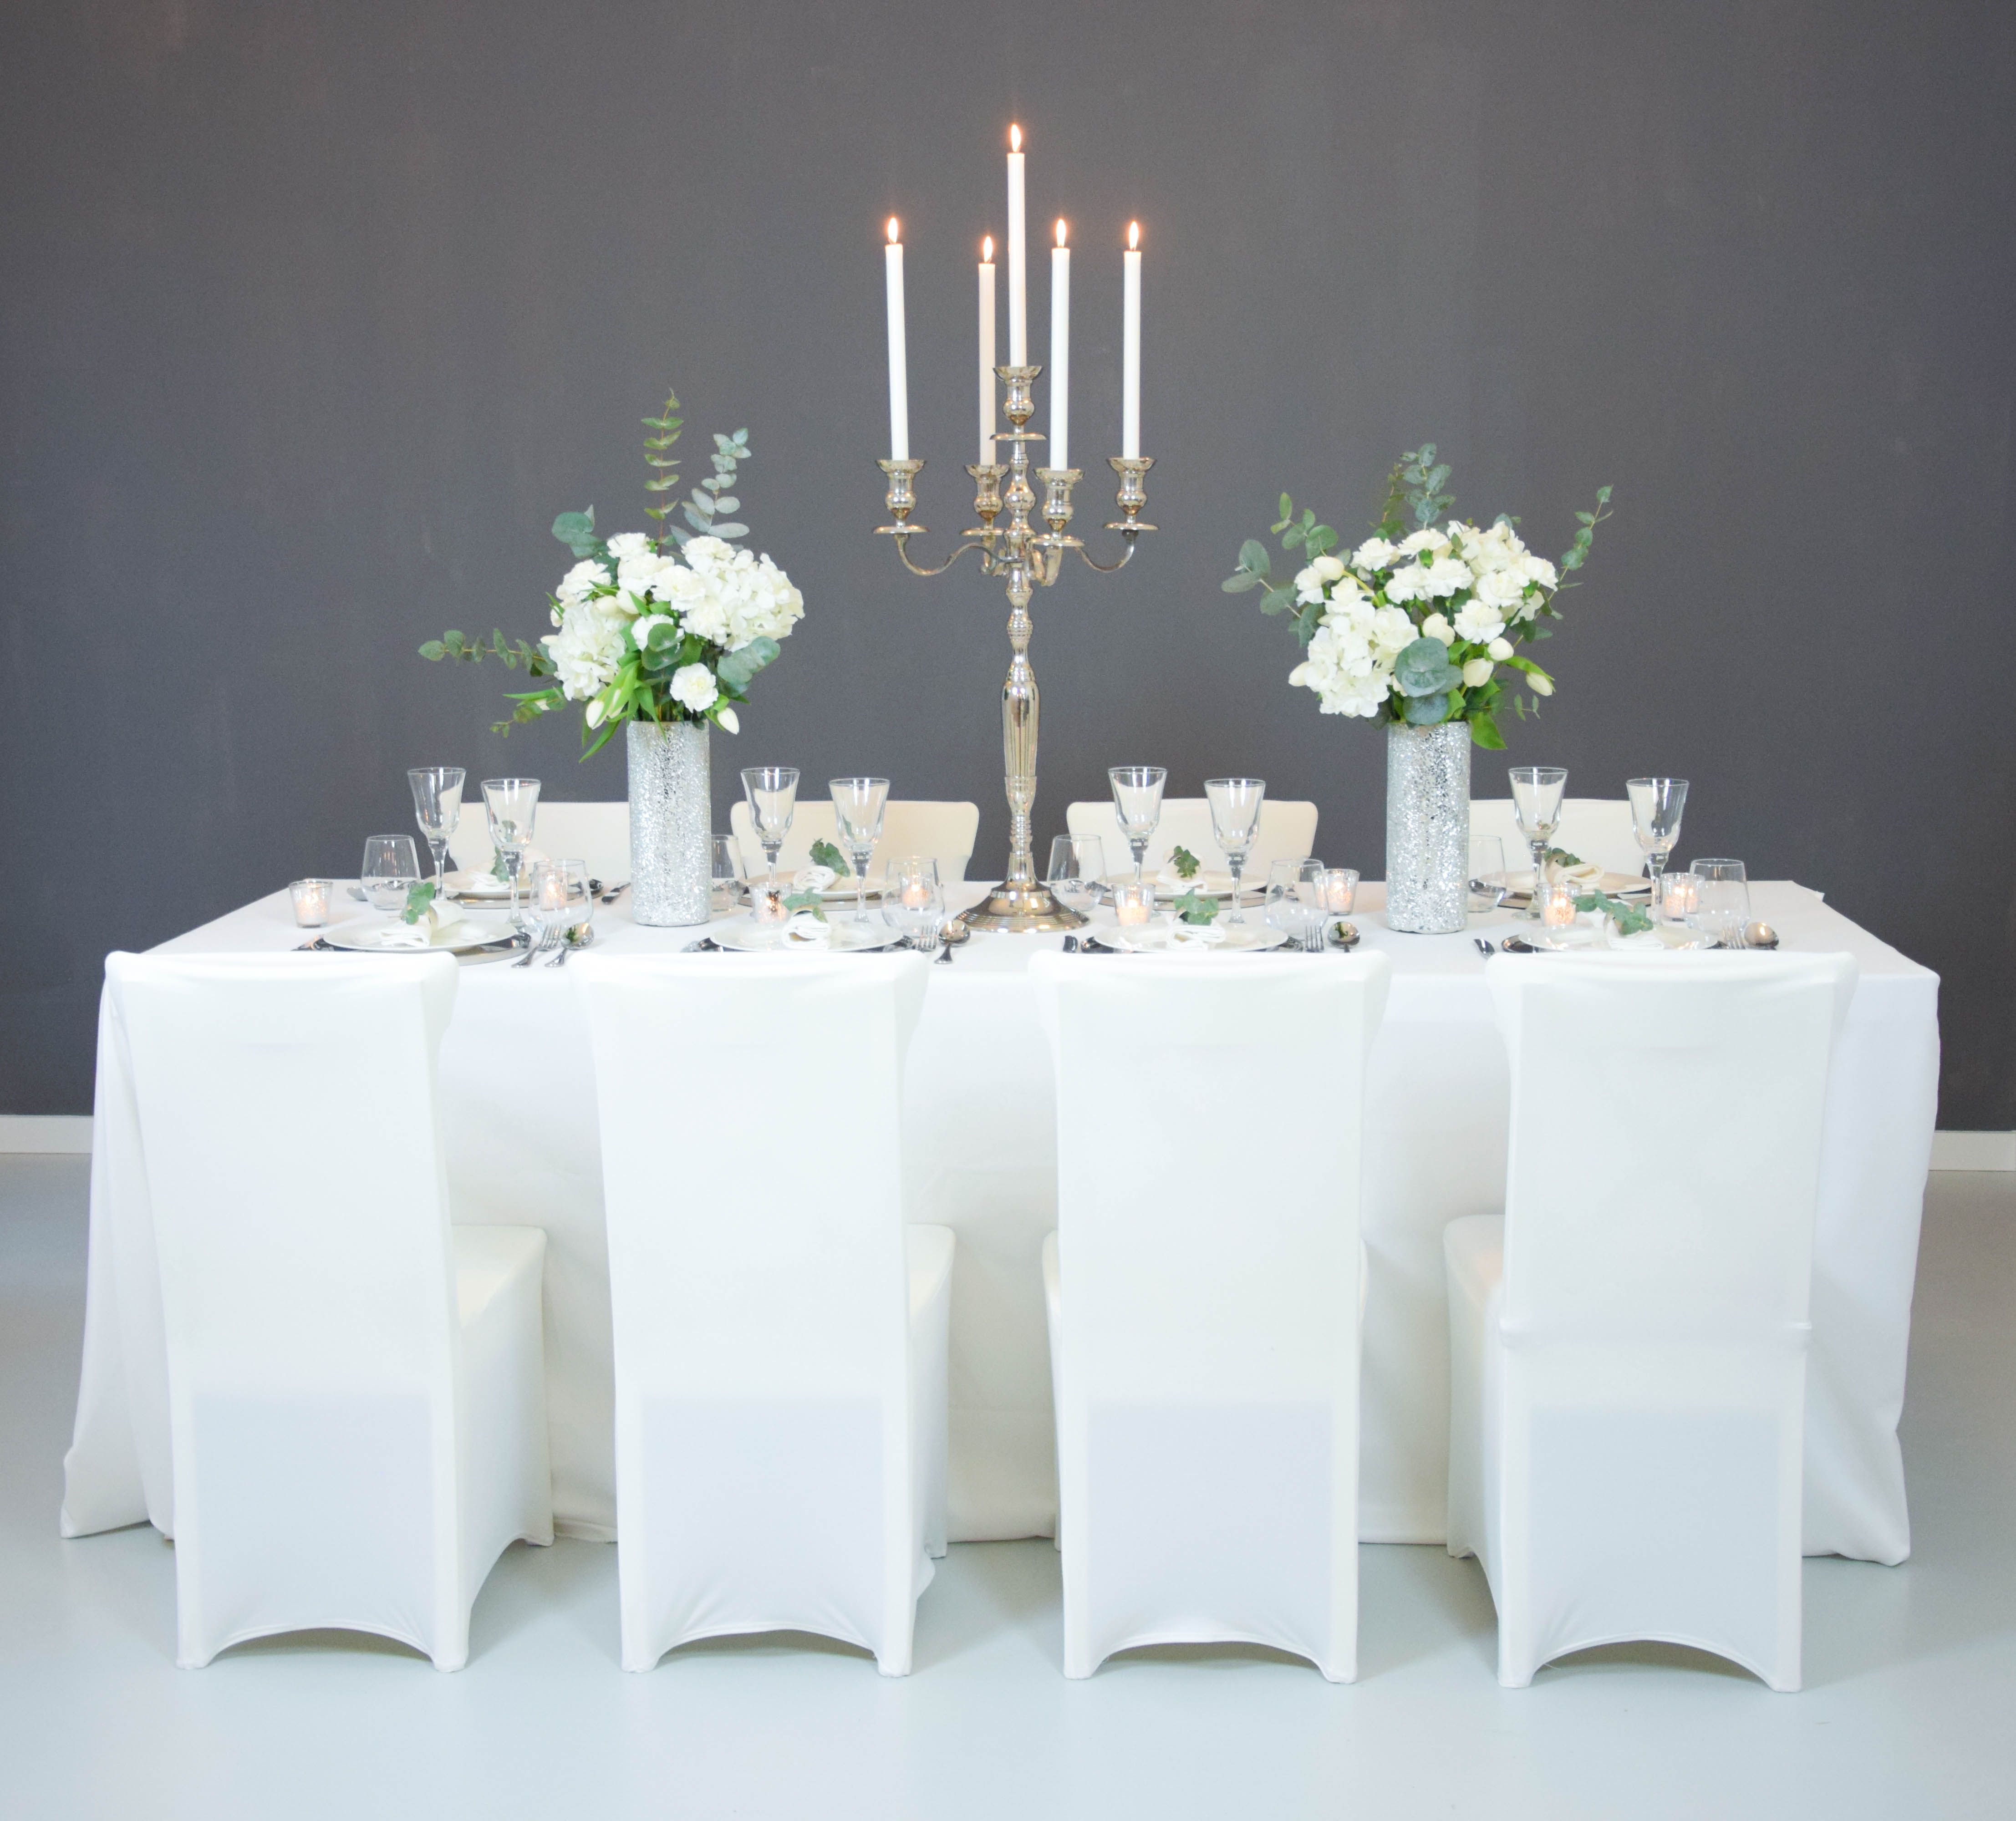 Dekoration i hochzeit i silber i wei i tulpen i glas i - Marmeladenglas deko ...